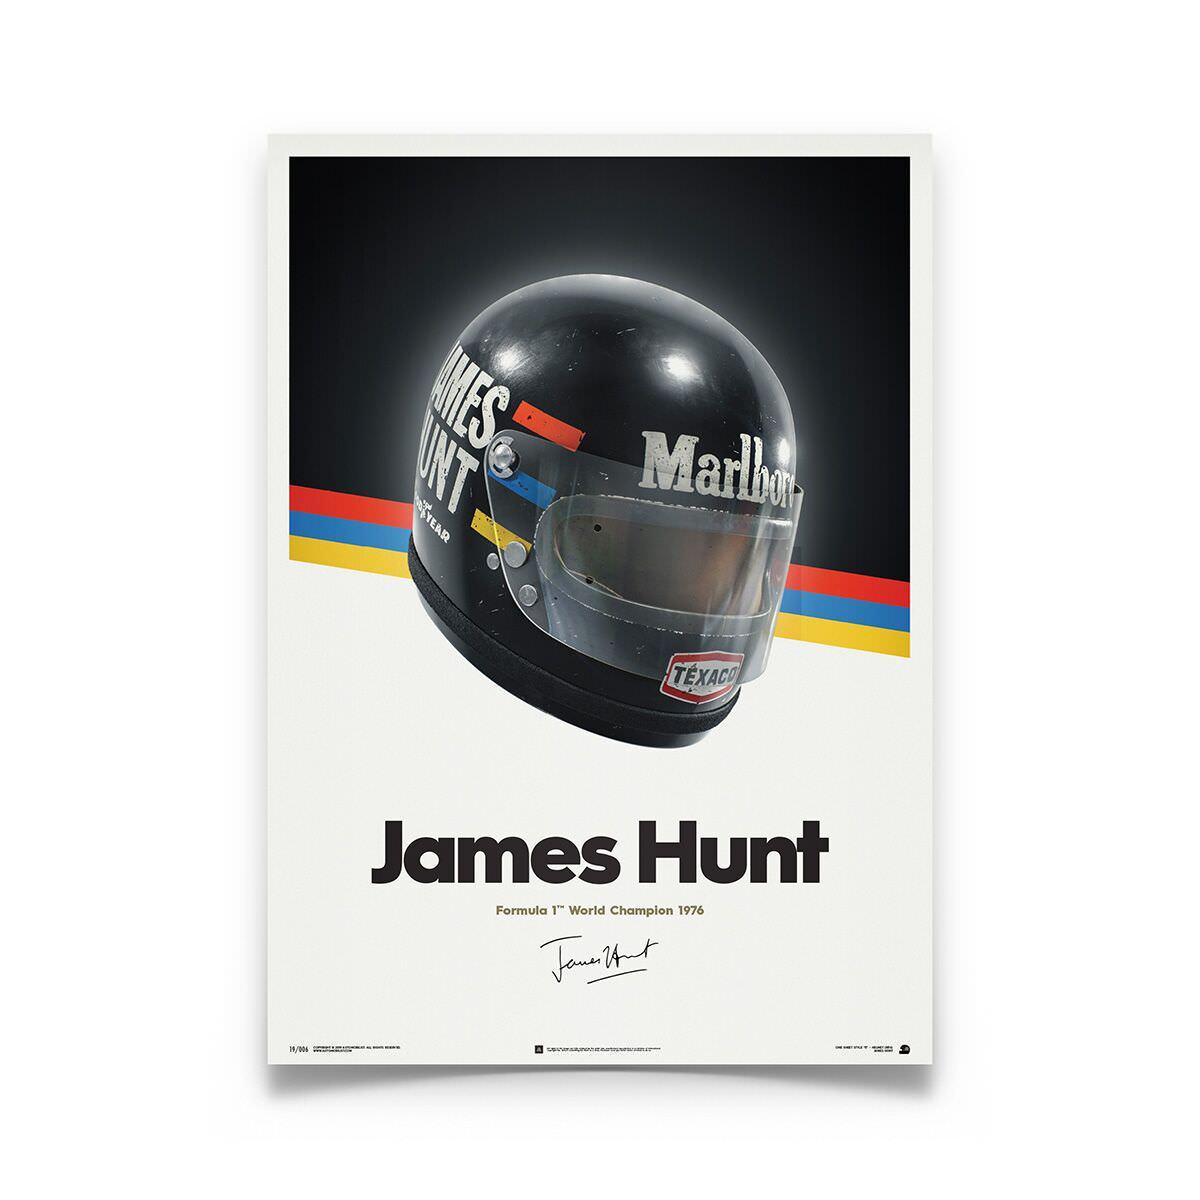 Product image for James Hunt Helmet 1976 Poster